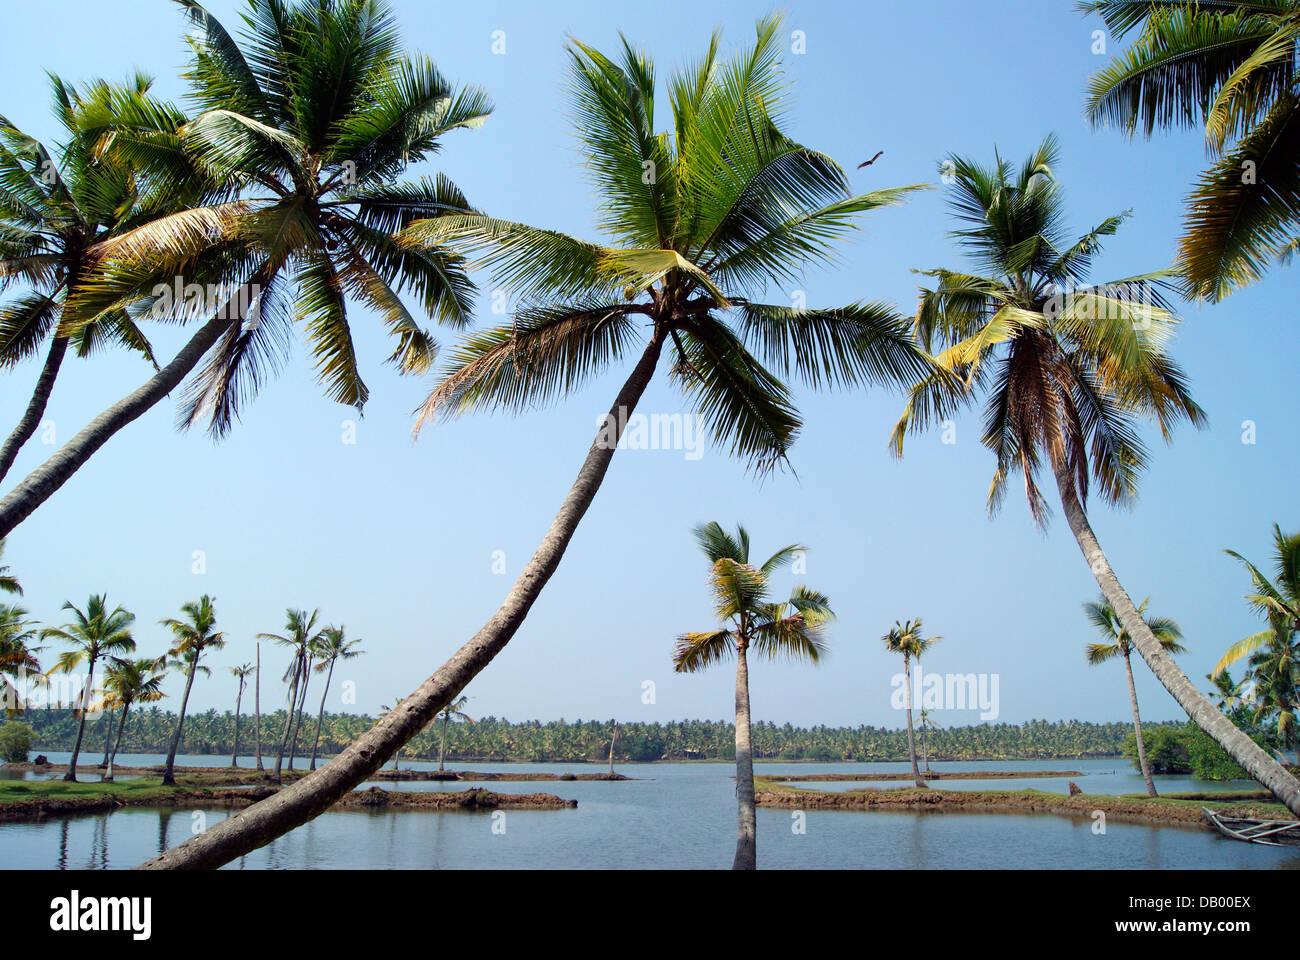 Coconuts Kerala Stock Photos & Coconuts Kerala Stock ...